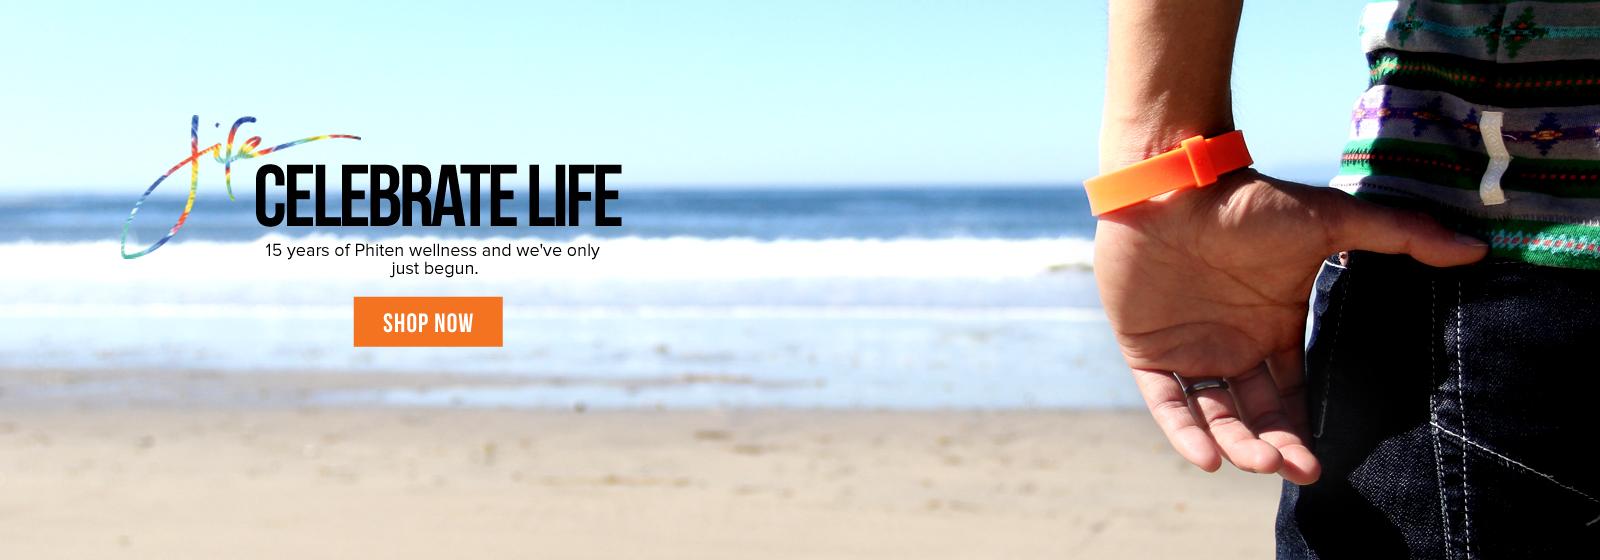 LIFE By Phiten